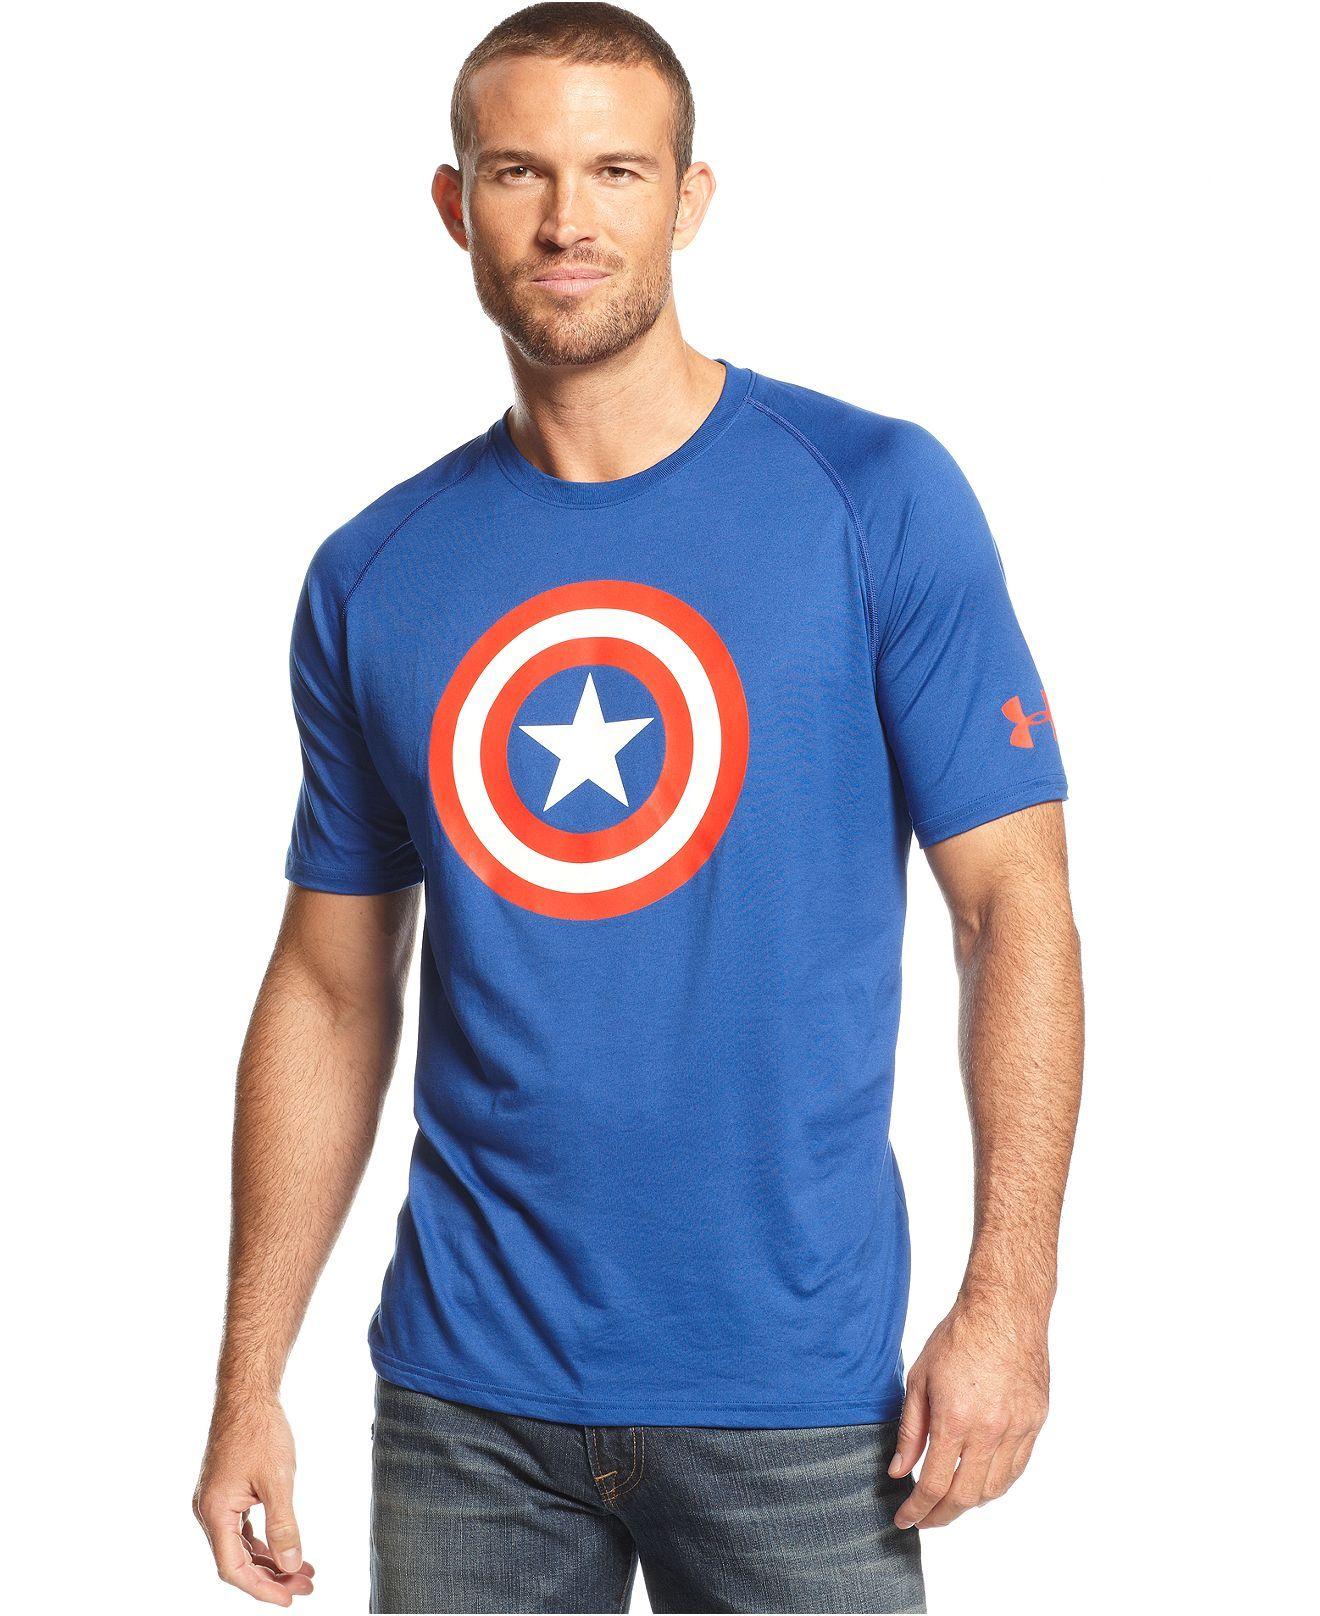 df334add Under Armour Shirt, Alter Ego Captain America T-Shirt - T-Shirts - Men -  Macy's【E7buy 美國頂級Macy國際免運再八折】這件可以再八折,不用 $1100